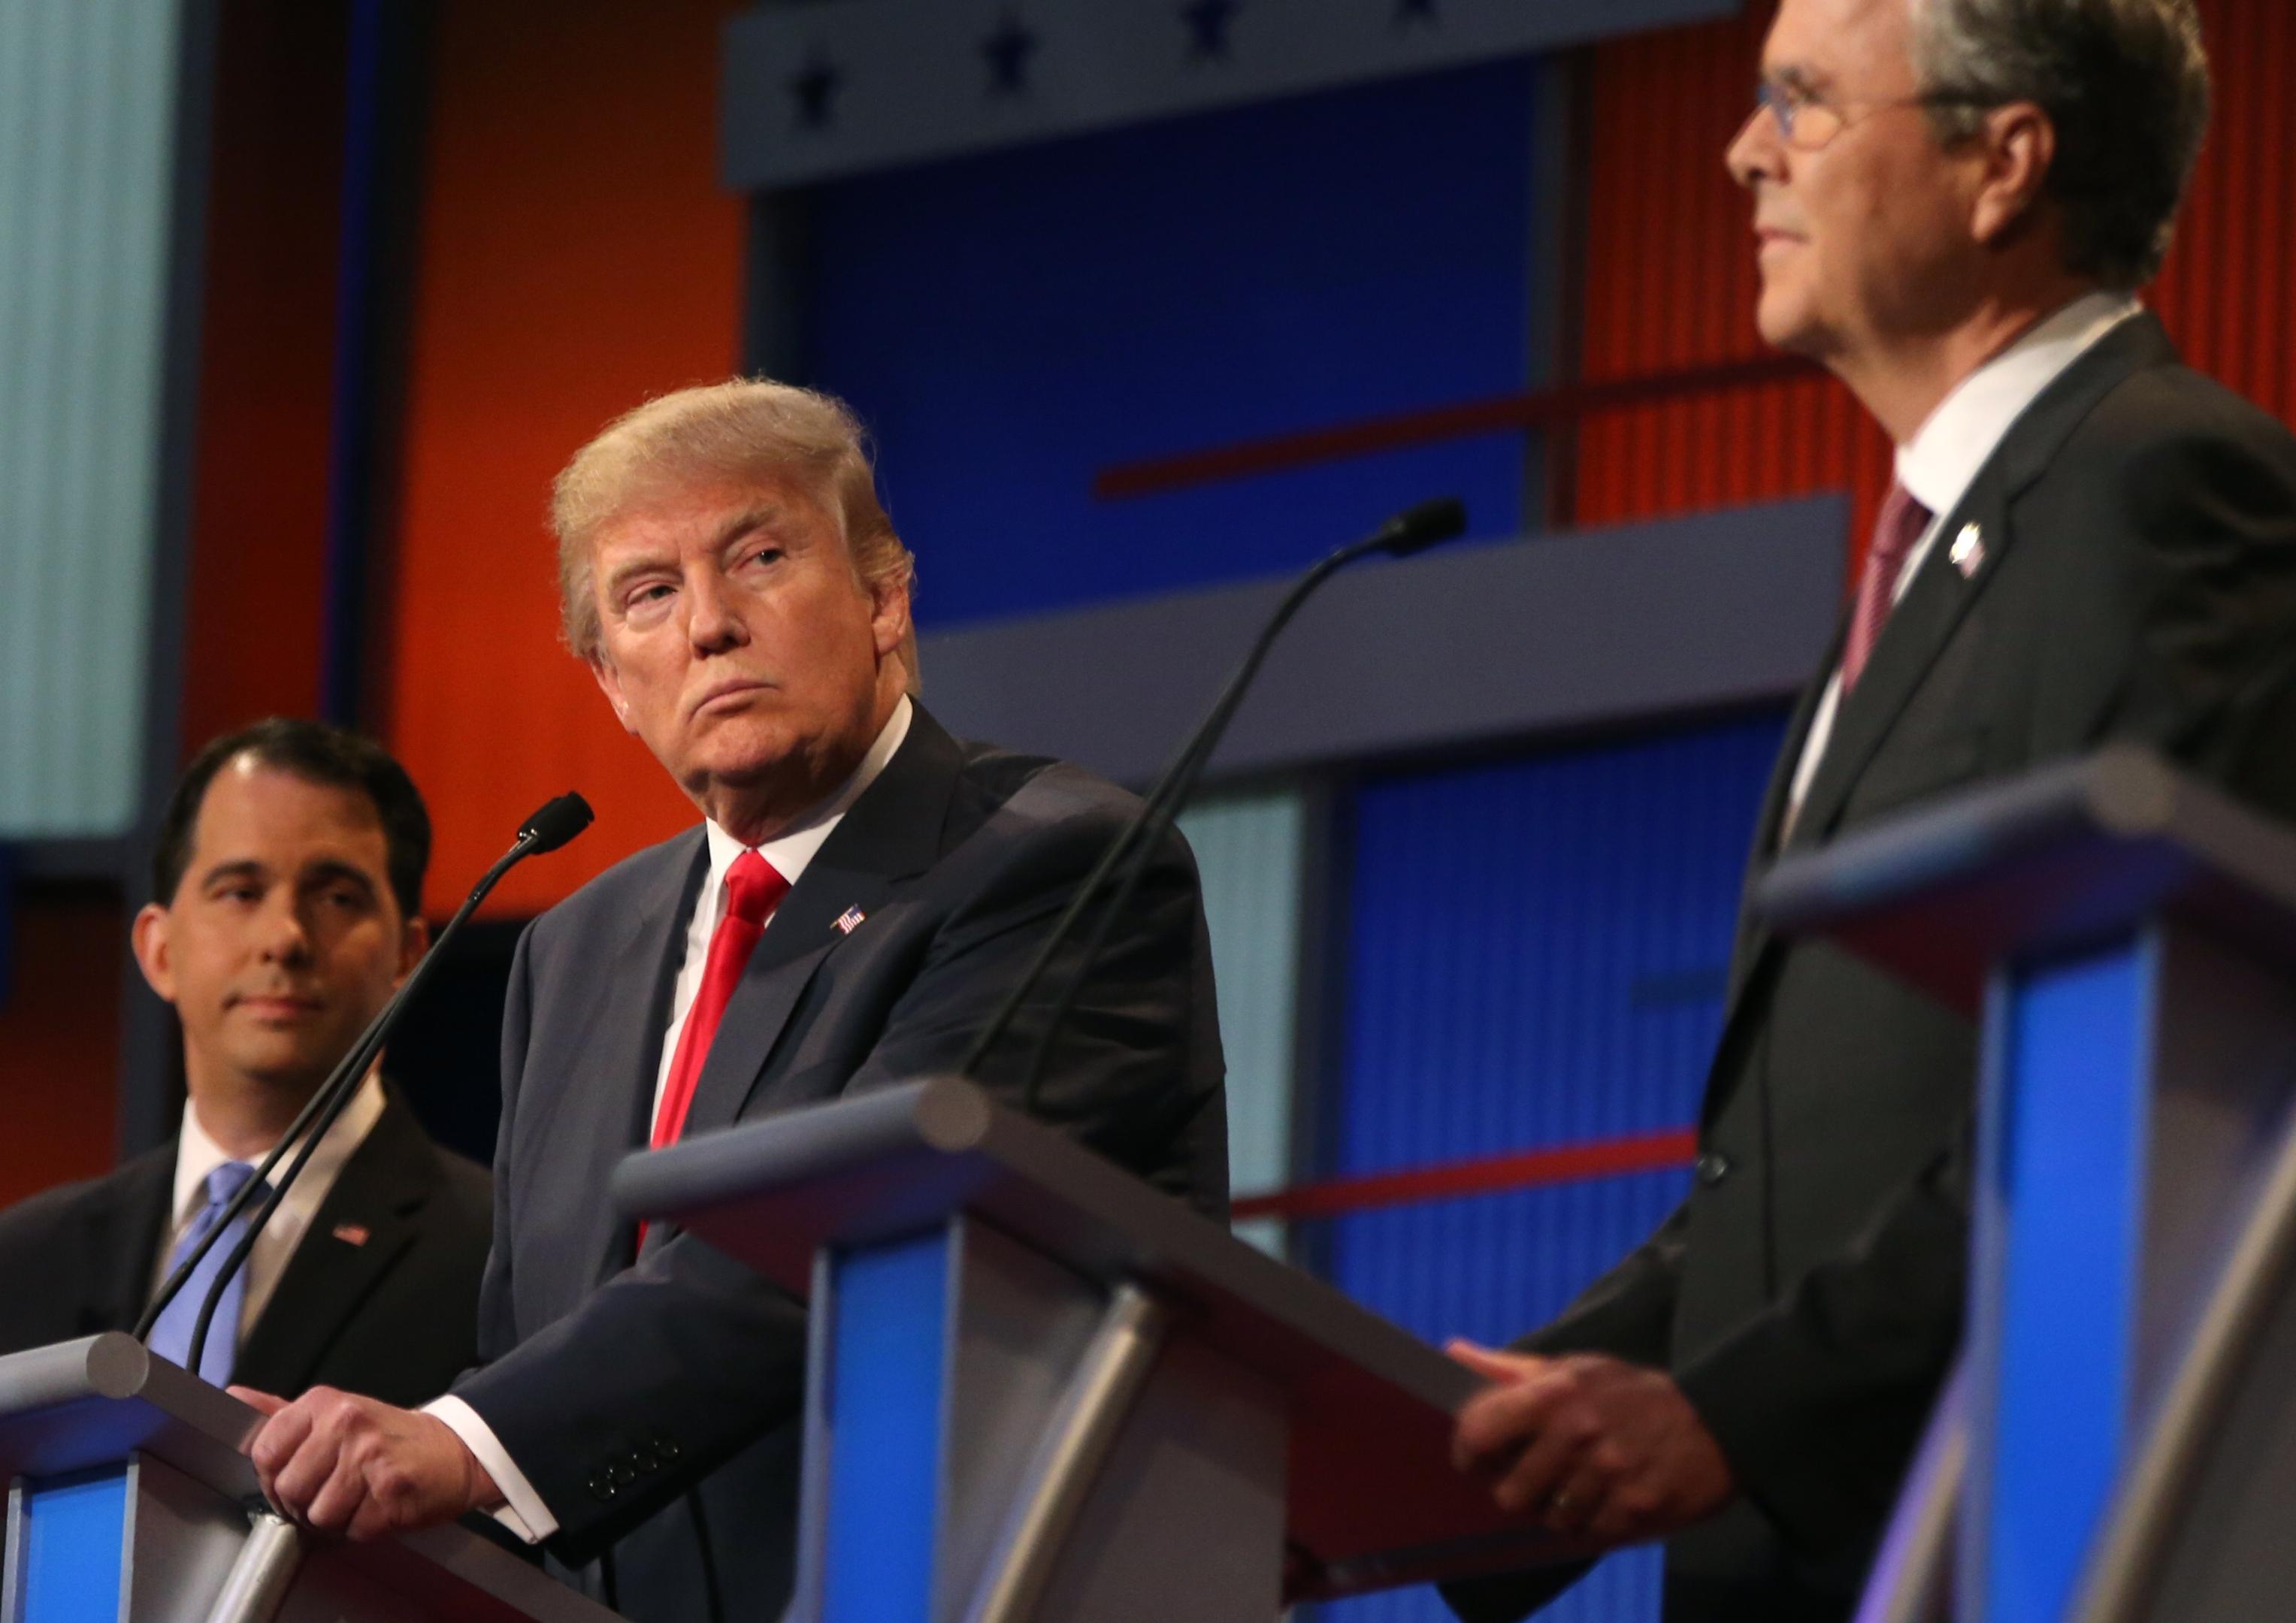 Republican presidential candidate Donald Trump looks toward Jeb Bush